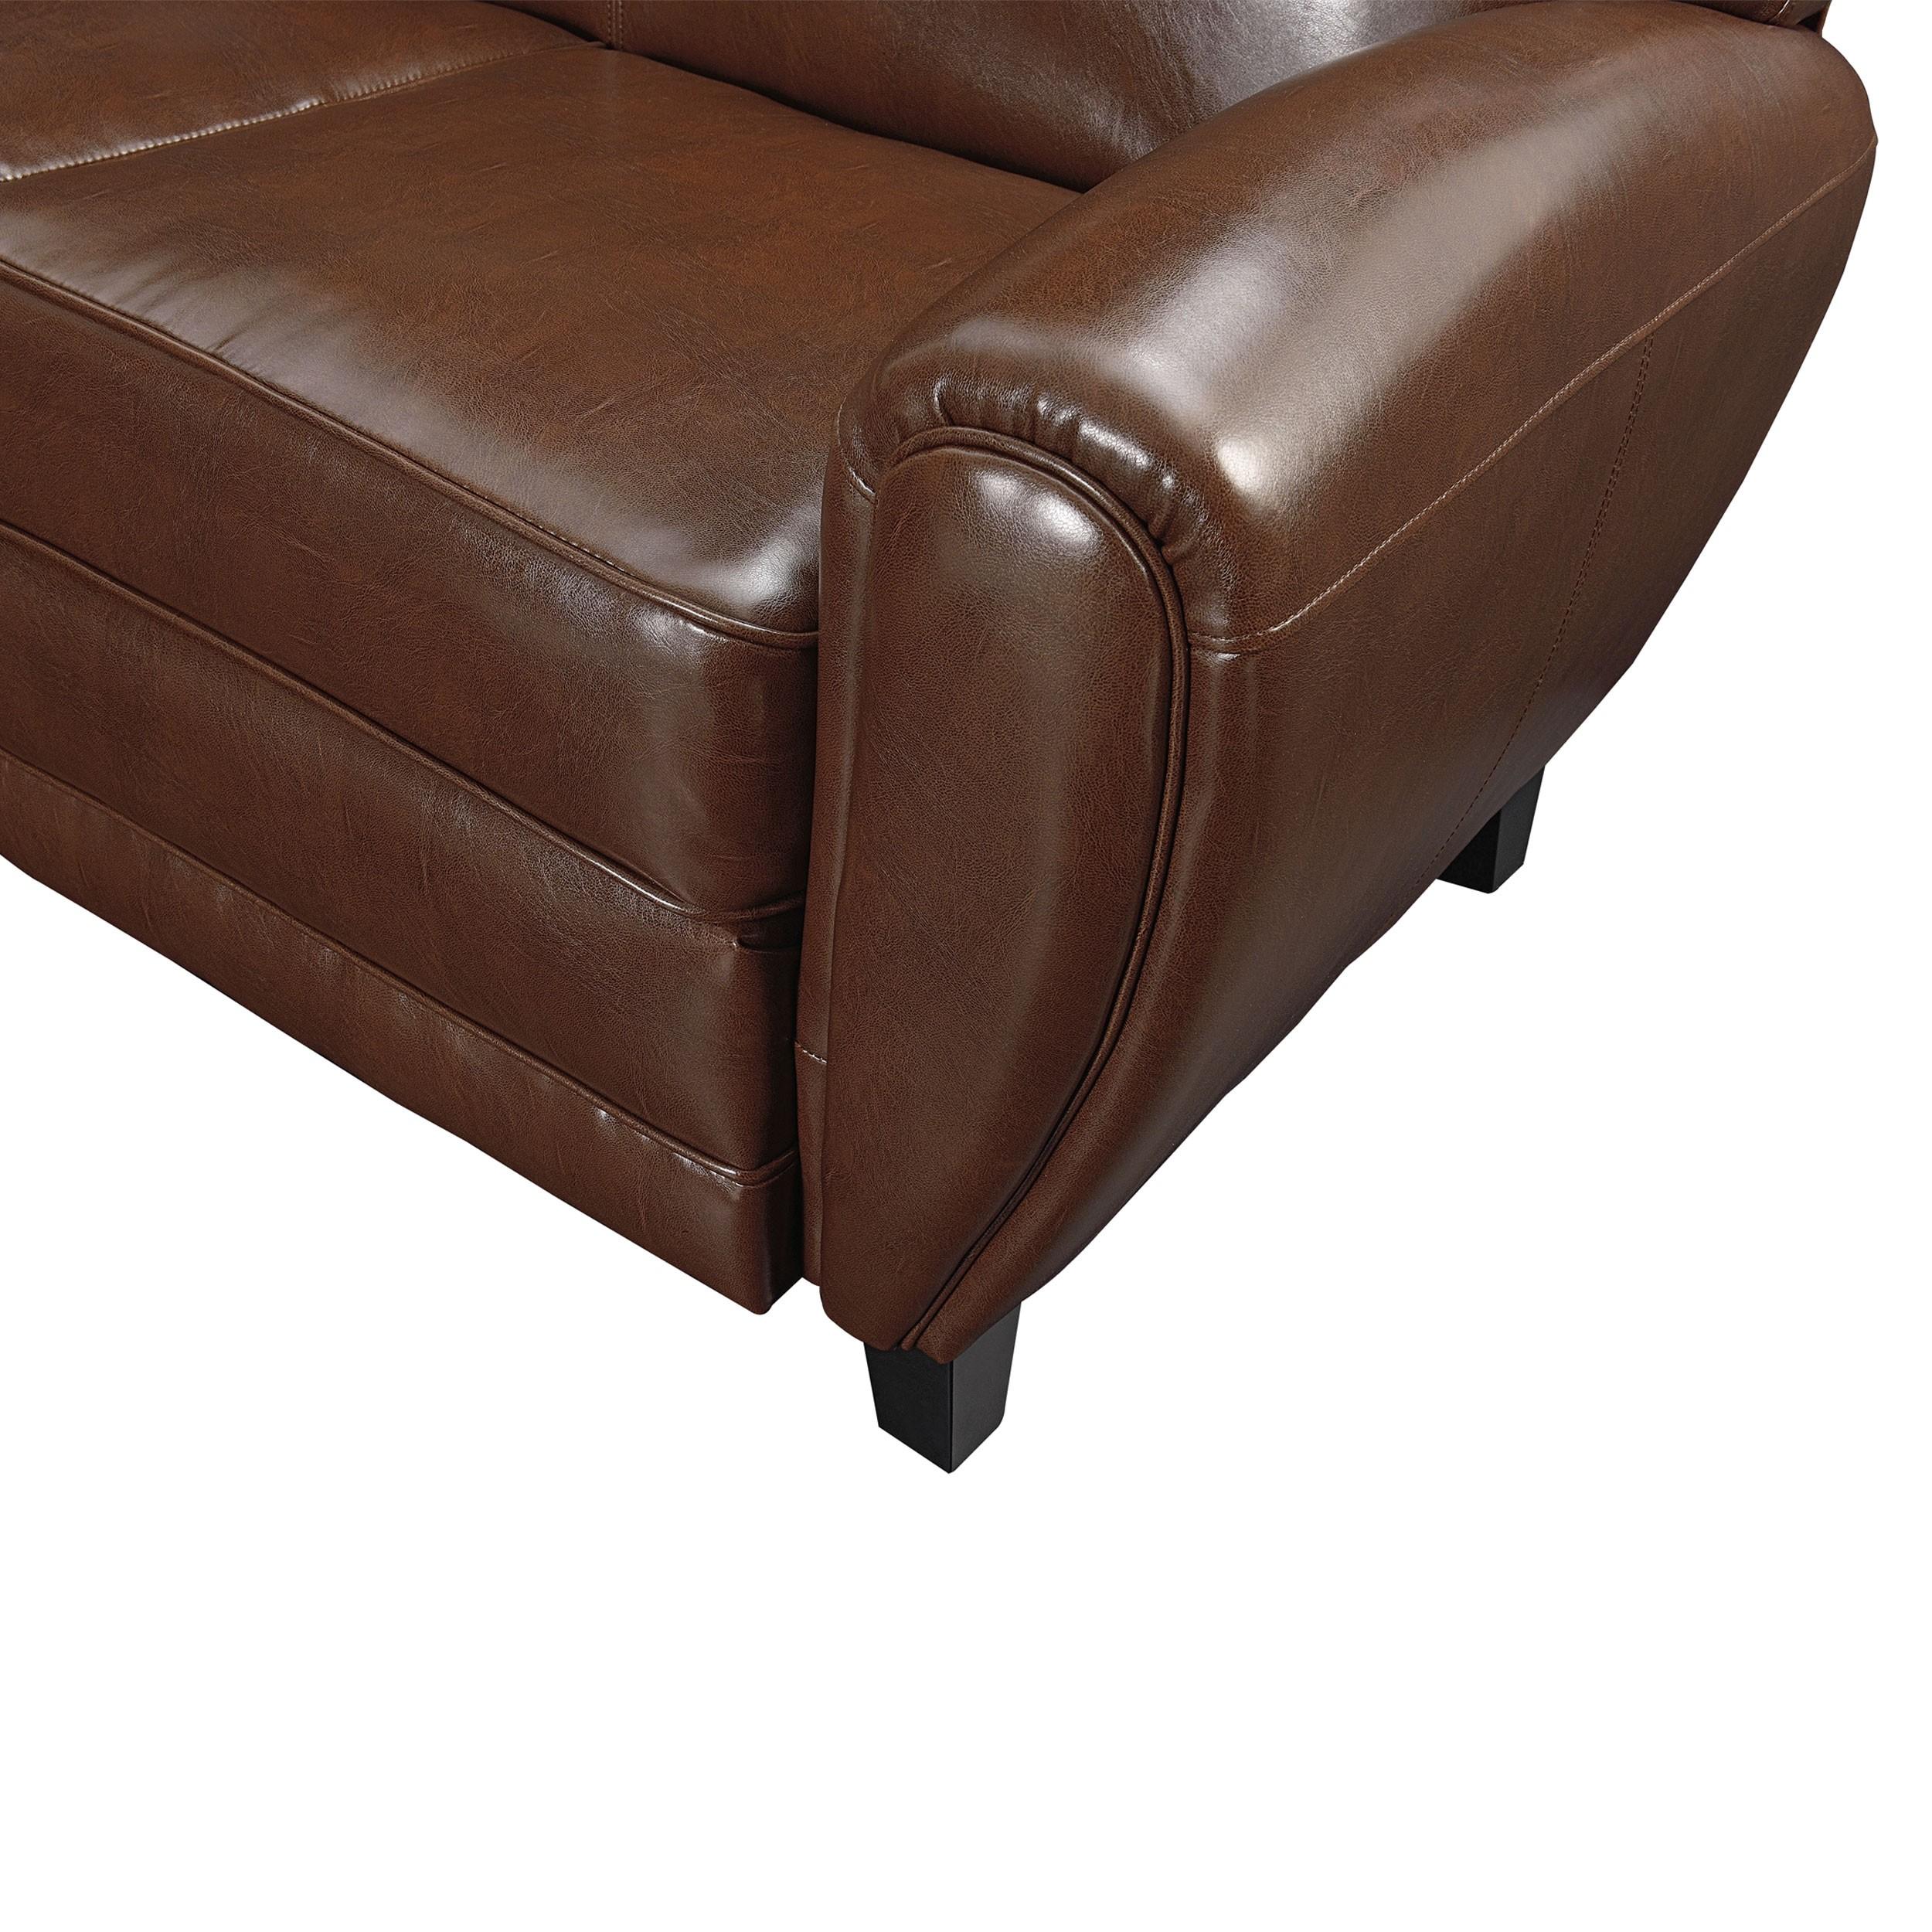 canap club 2 places cuir marron commandez nos canap s club 2 places cuir marron rdv d co. Black Bedroom Furniture Sets. Home Design Ideas